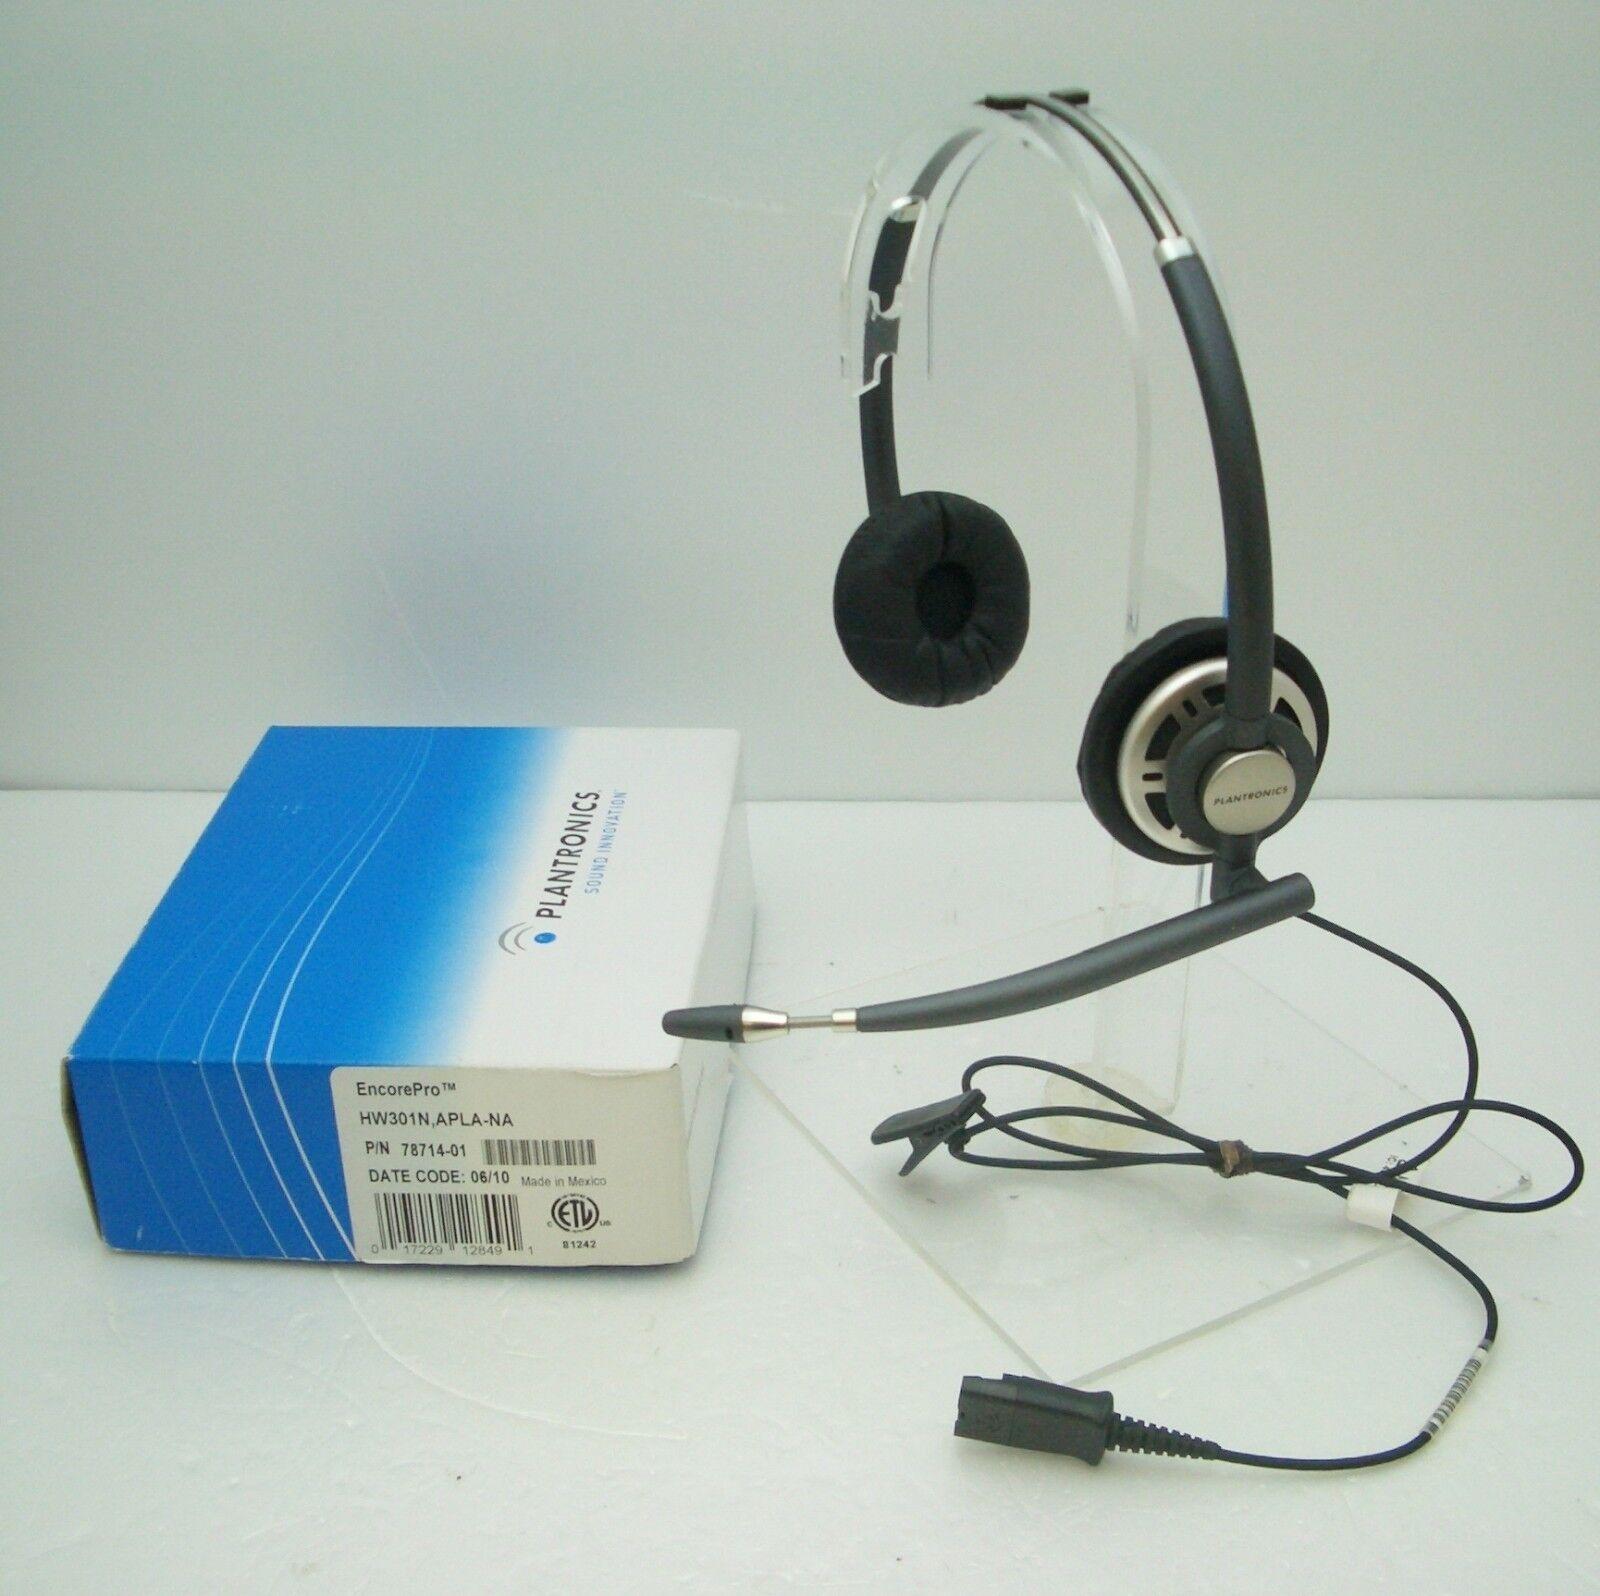 Plantronics HW301N EncorePro Binaural Office Telephone Noise Canceling Headset